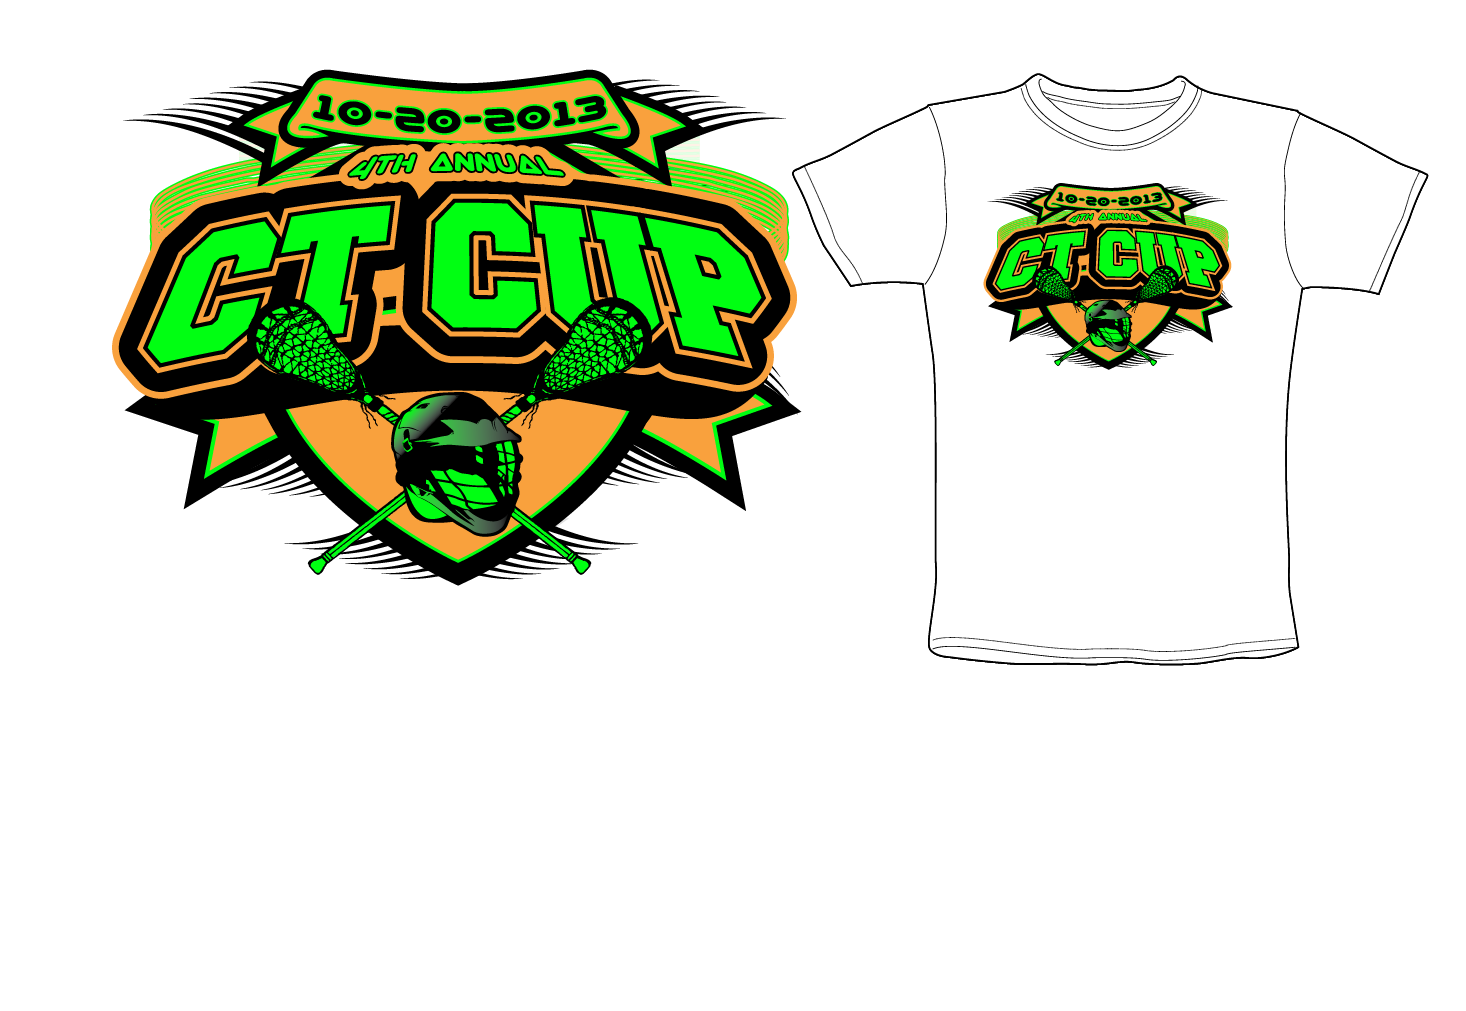 10-20-2013-4th-Annual-CT-CUP-print-ready